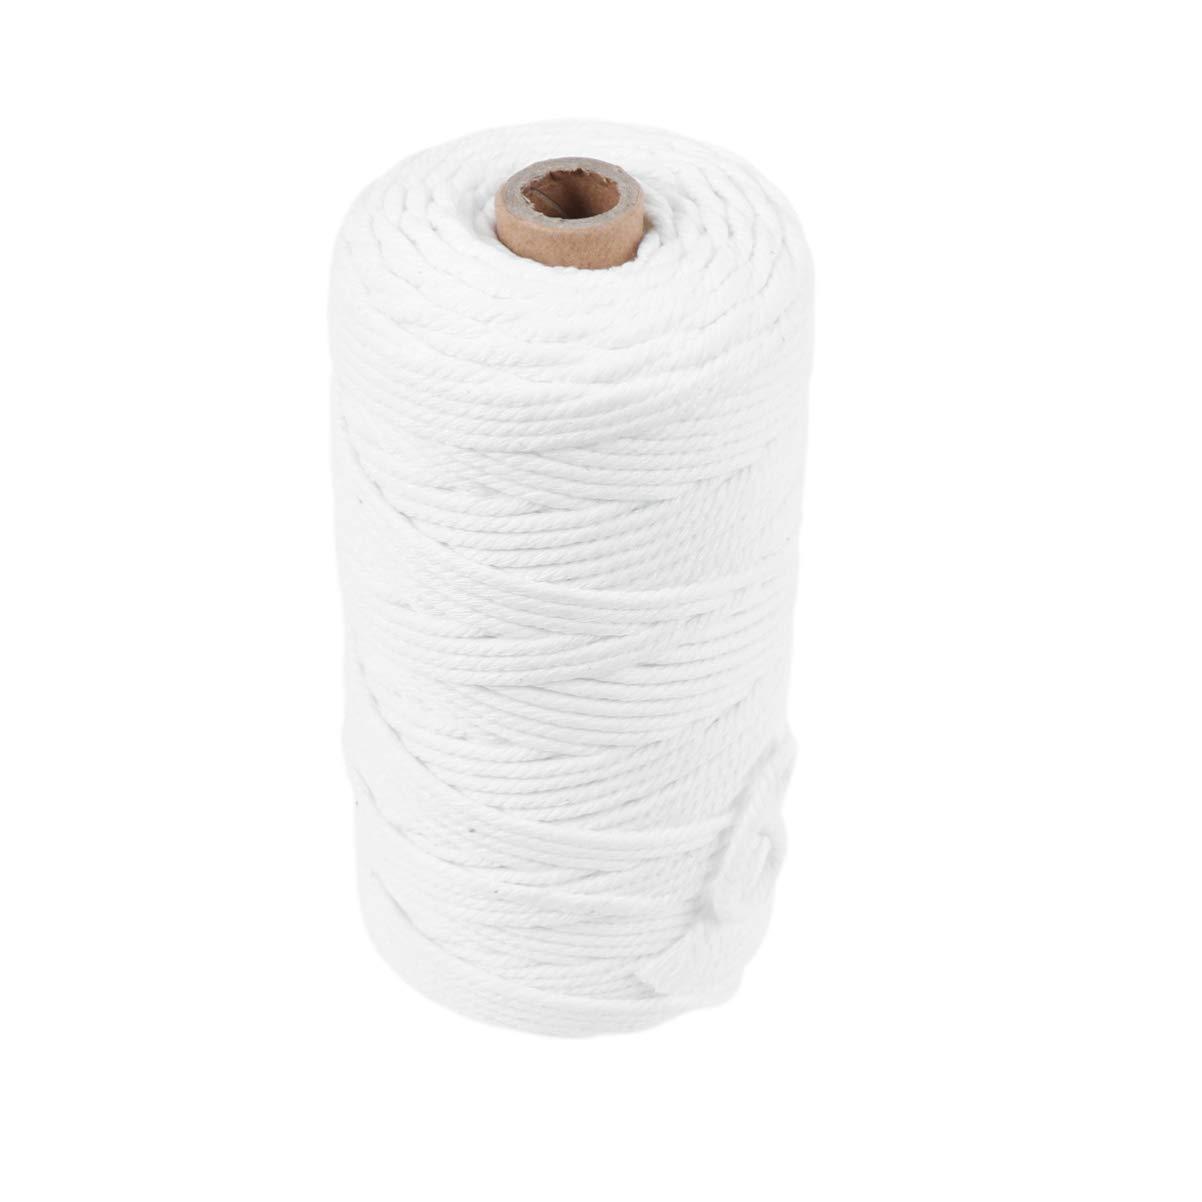 SUPVOX 100m 3mm Cable de algodón Suave Tapiz de Cuerda Artesanal ...